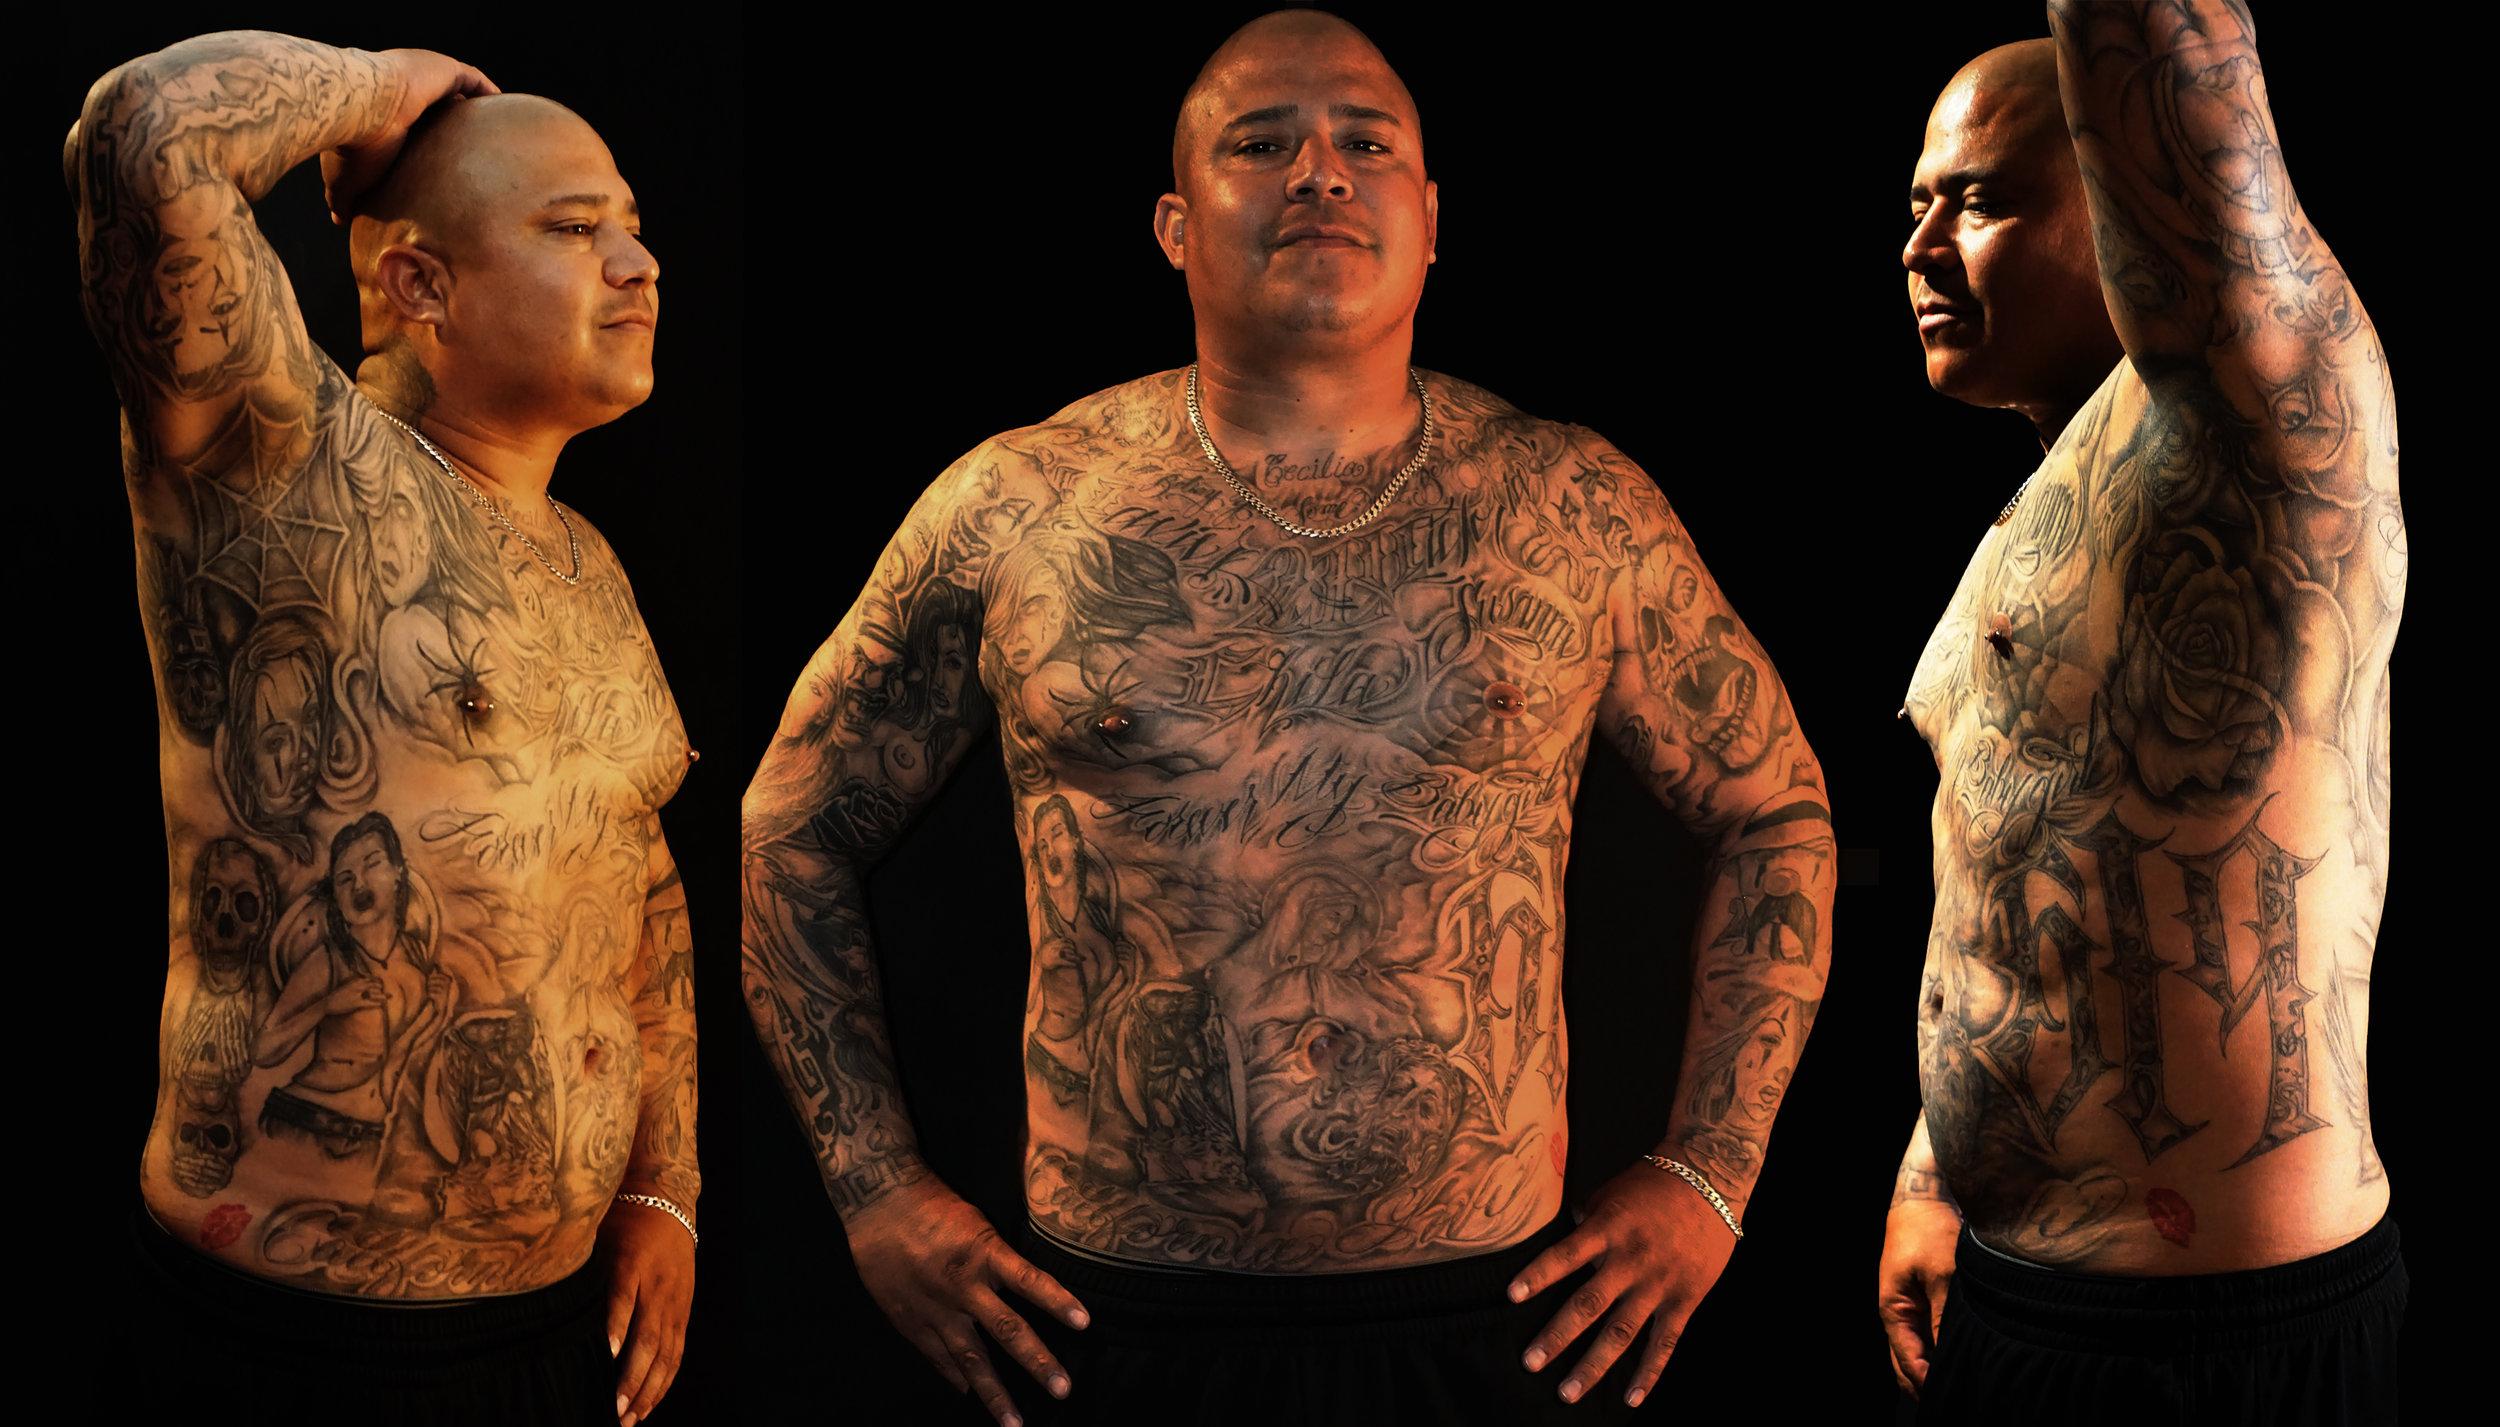 Full torso tattoo black and gray. Lettering, portrait, roses, skulls, spiderweb, spiders, 619.